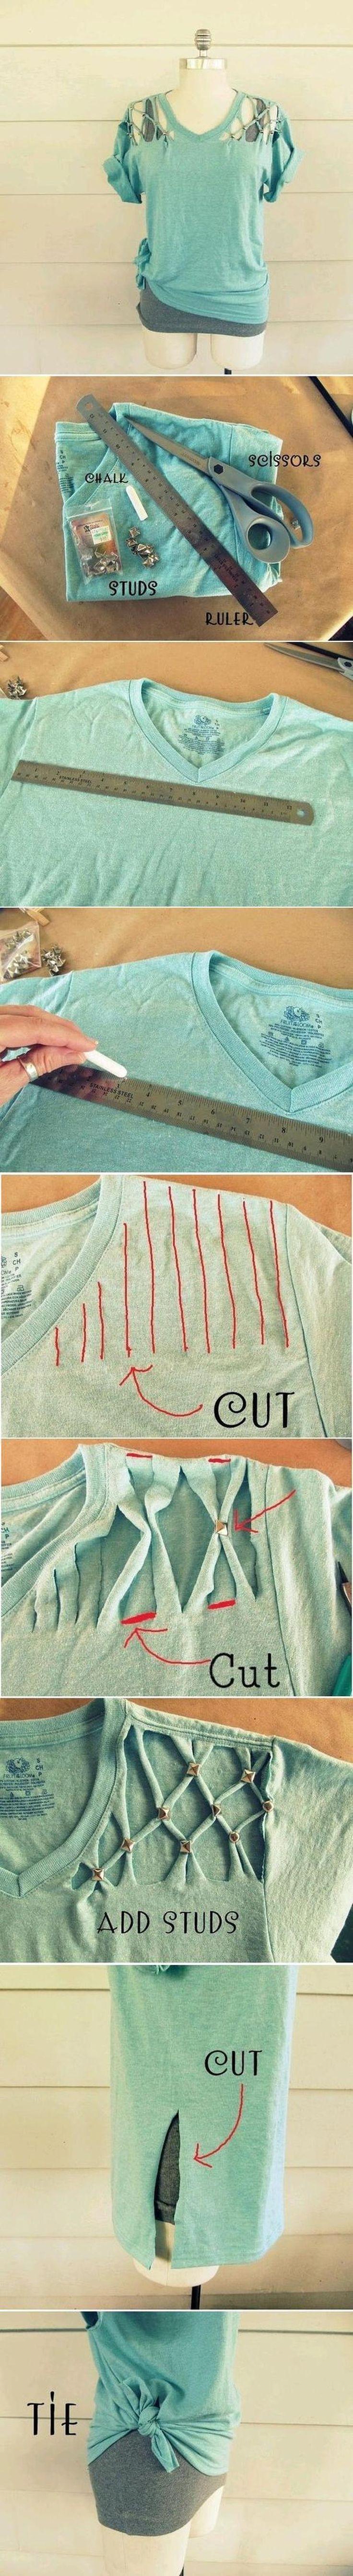 T-SHIRT MODIFIED - shoulder cut outs